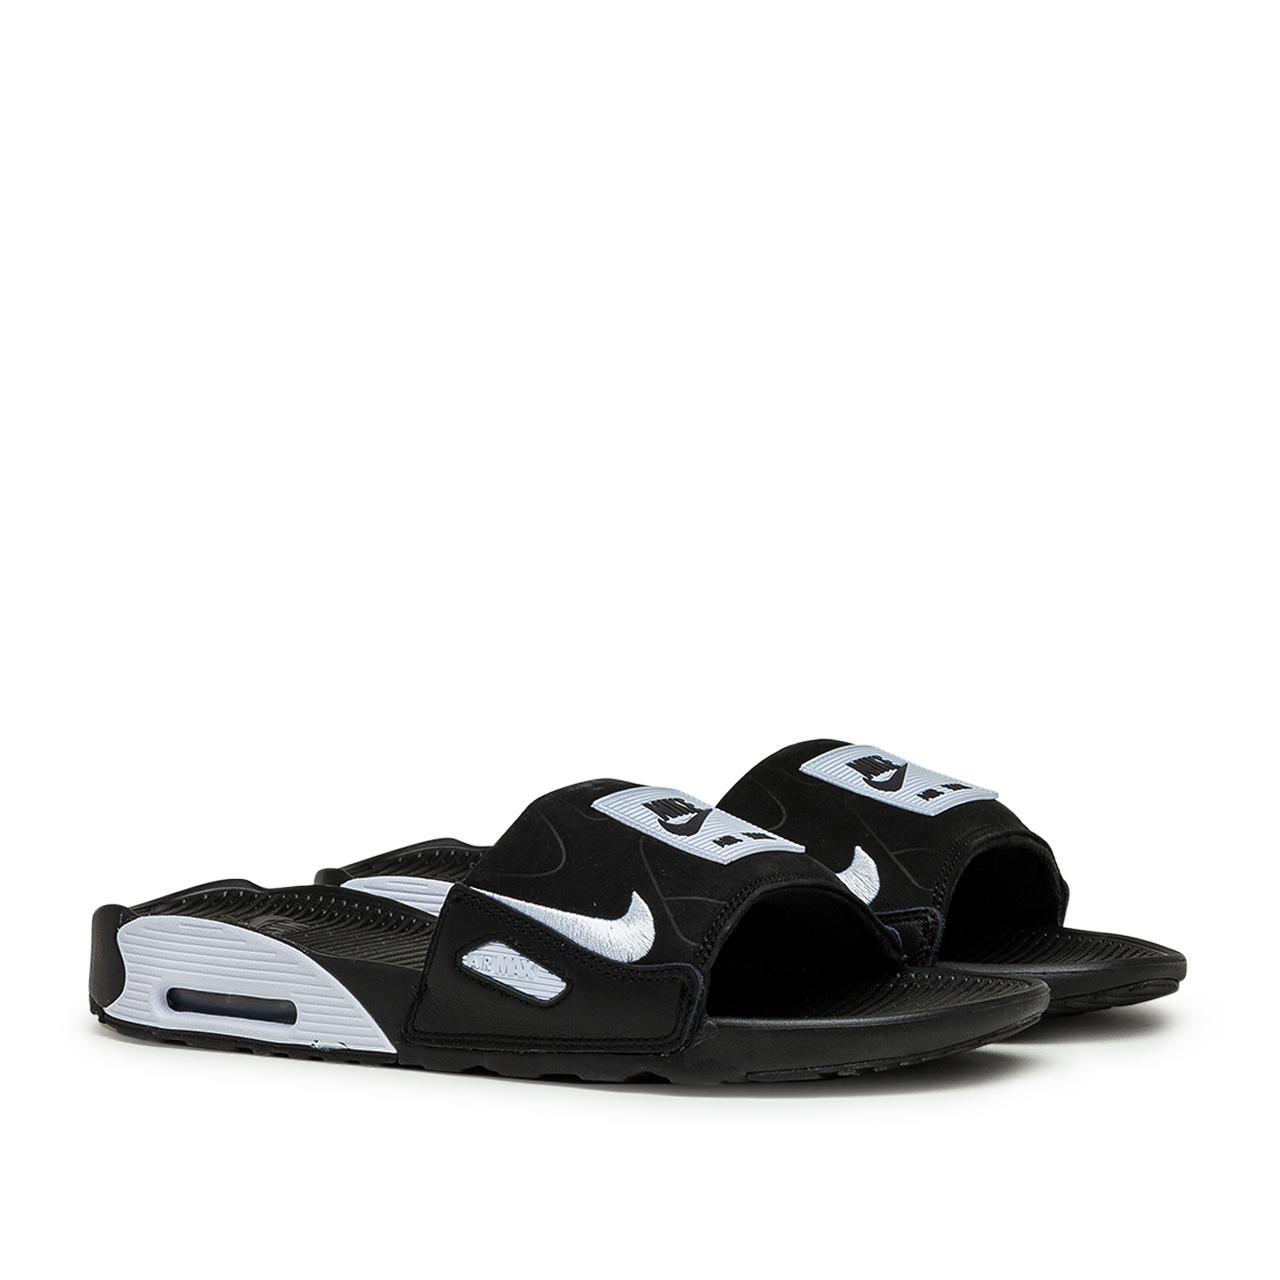 Nike Air Max 90 Slide in Black   White (Black) for Men - Save 53 ...